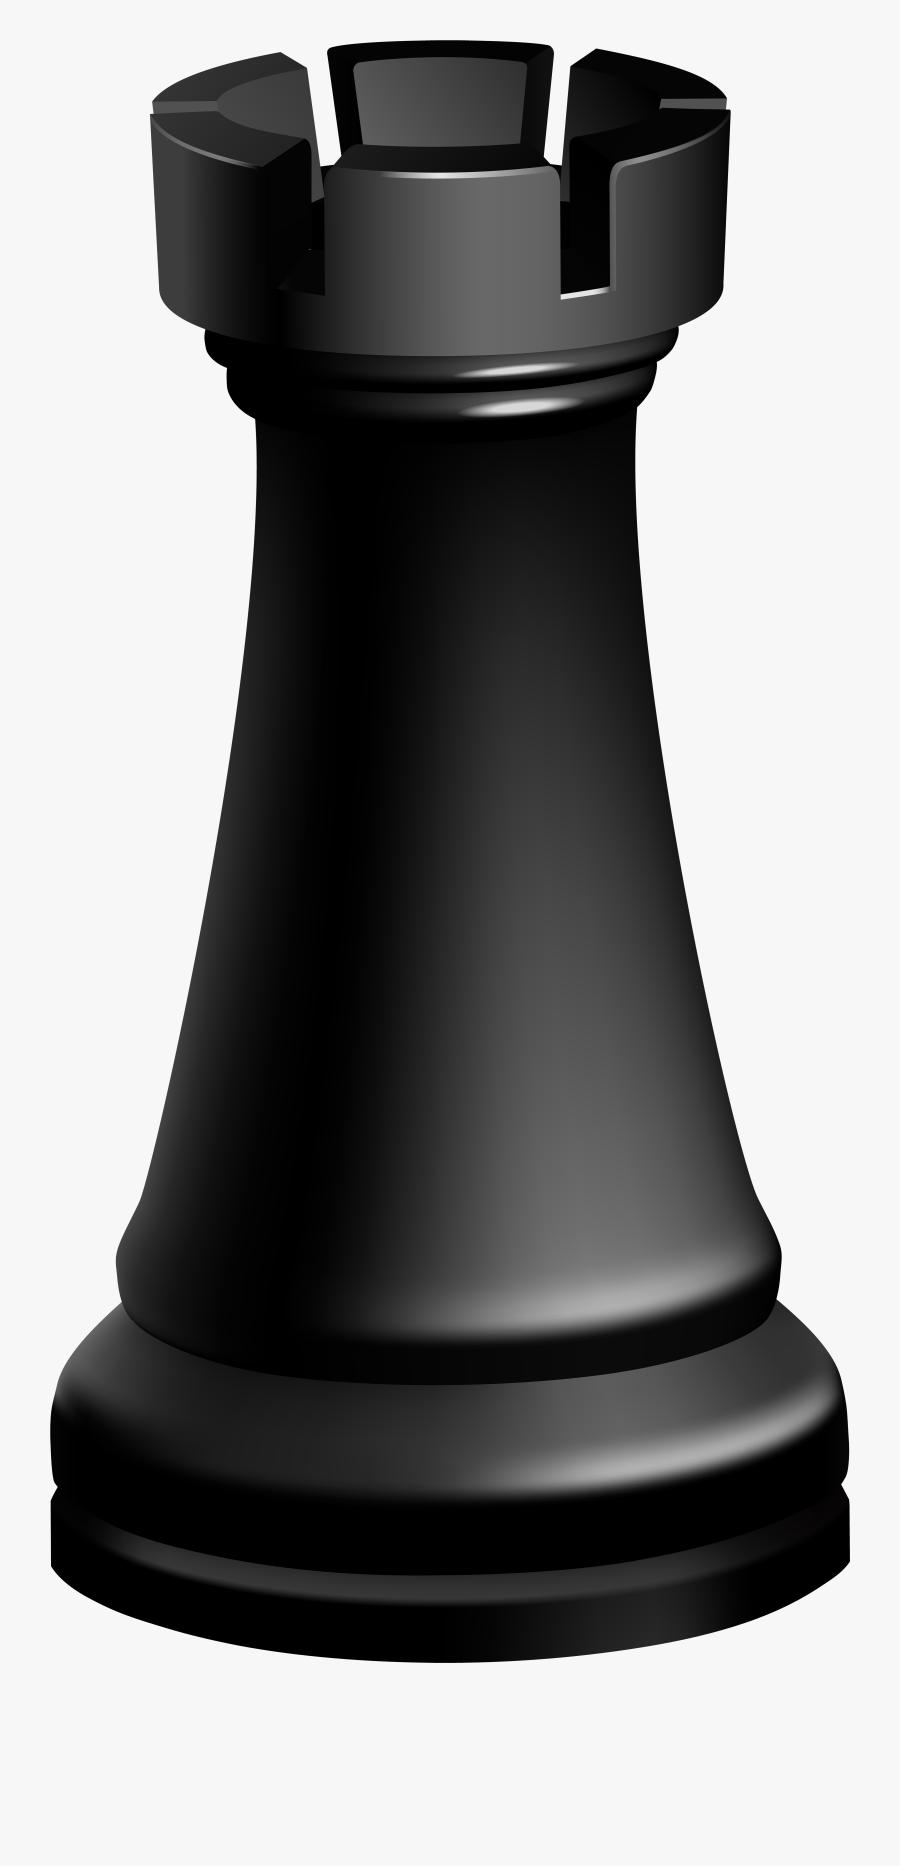 Rook Black Chess Piece Clip Art.